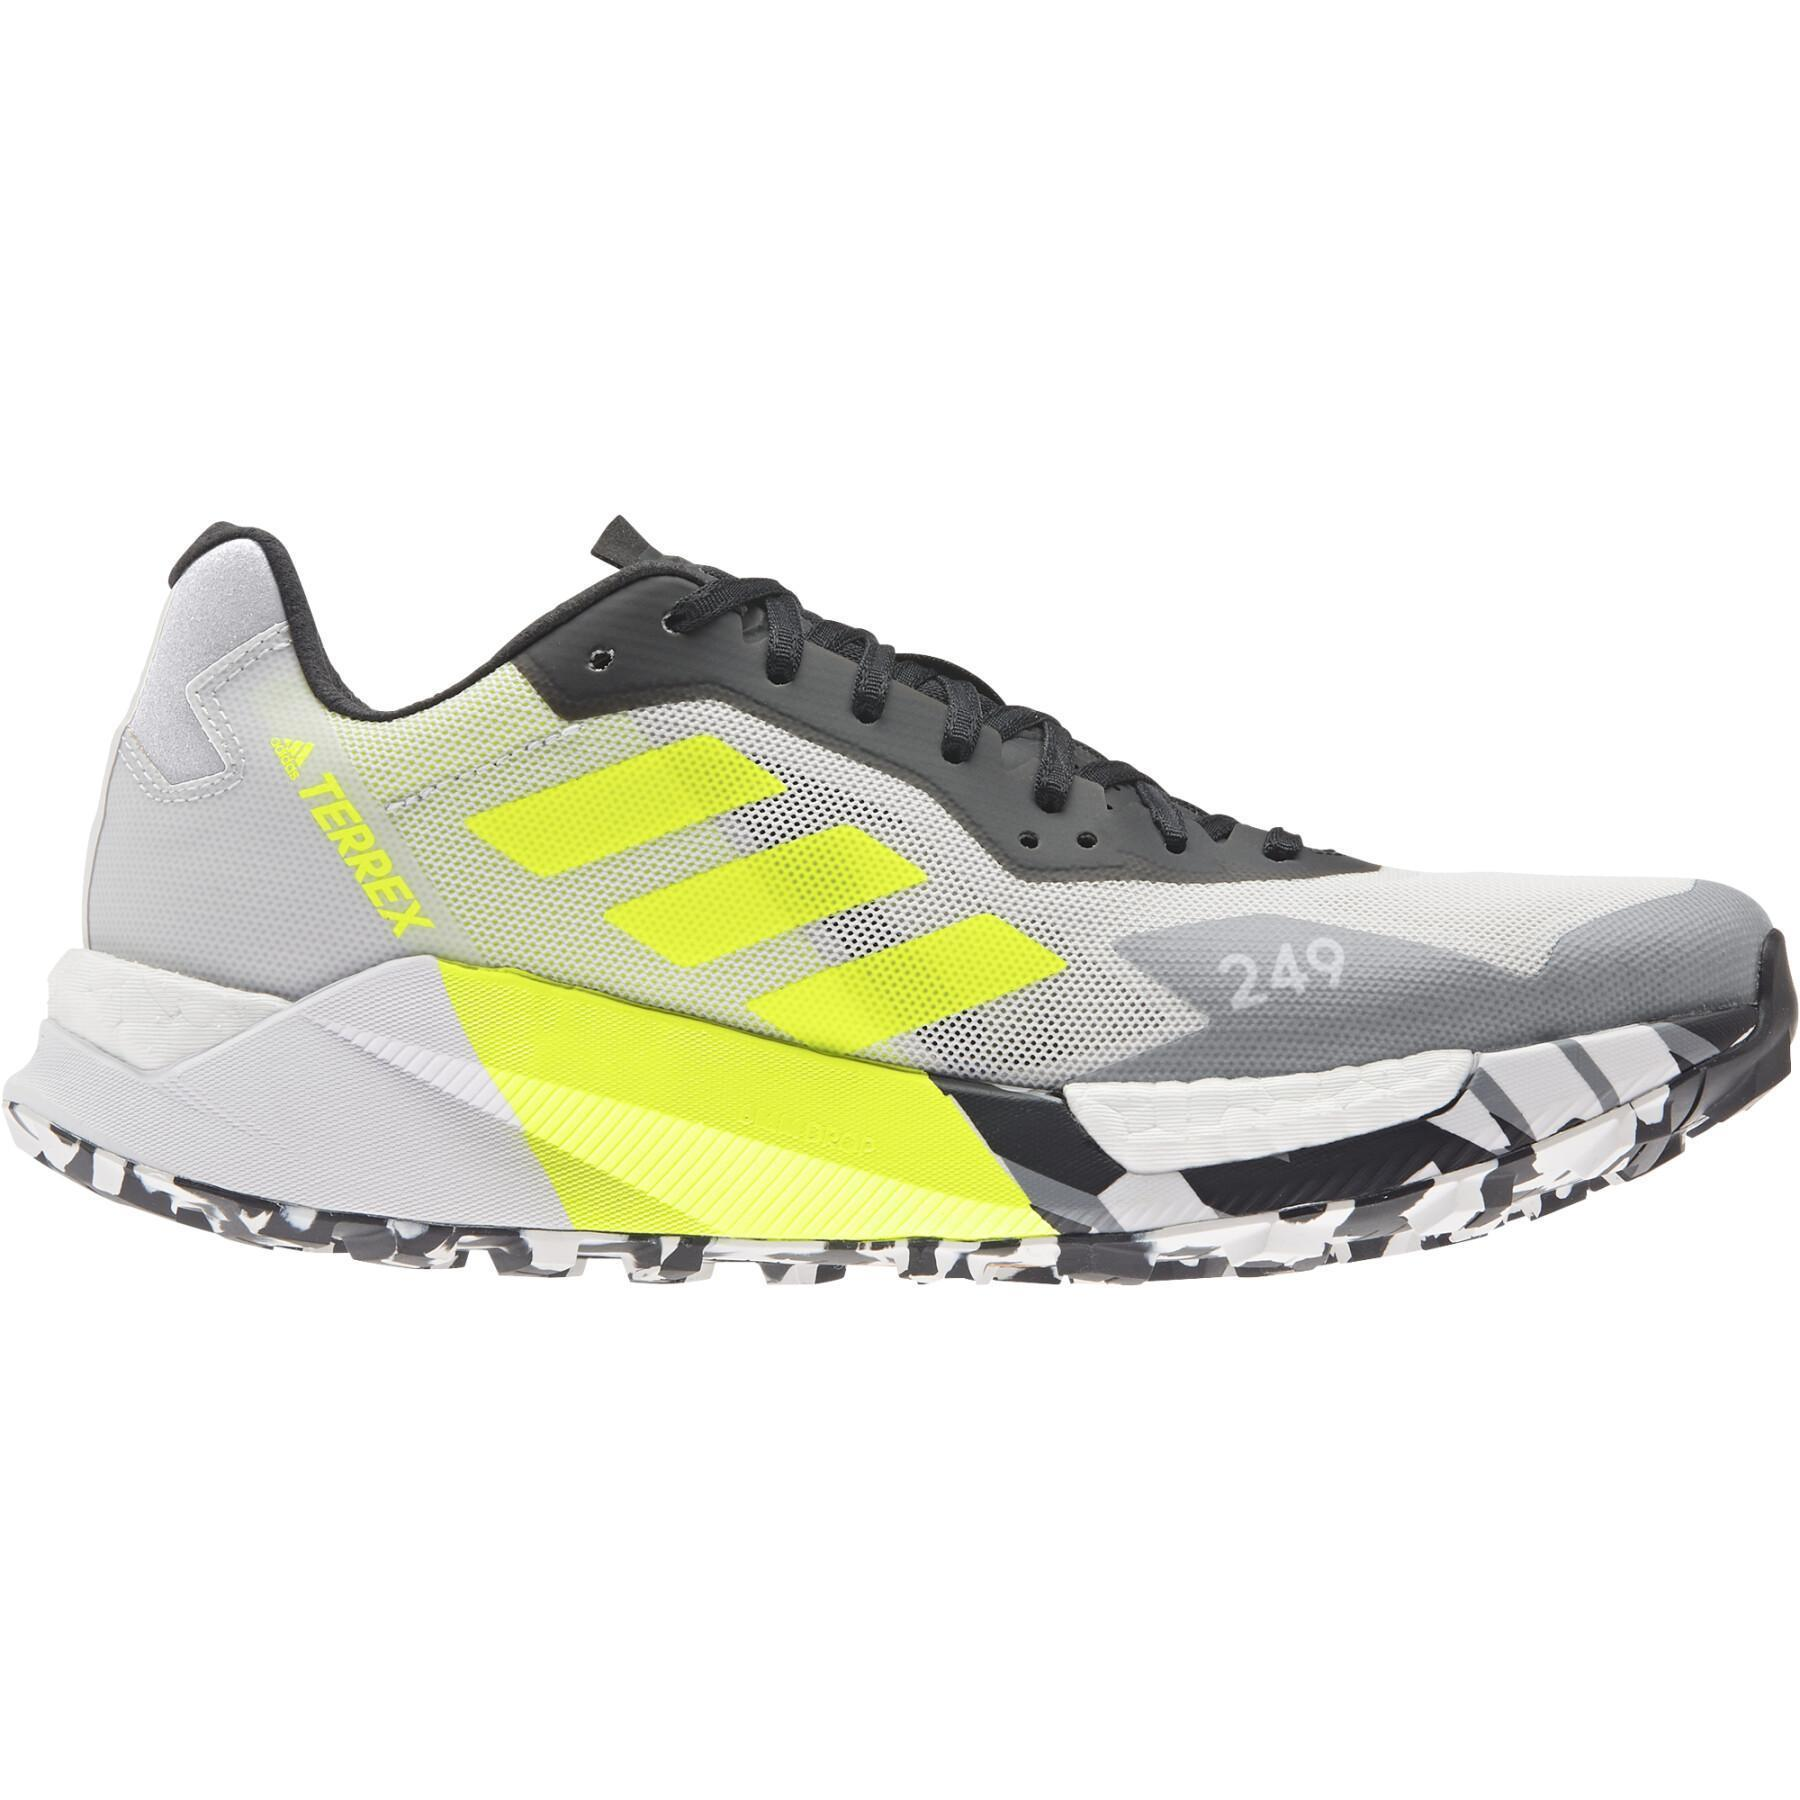 Women's trail shoes adidas Terrex Agravic Ultra